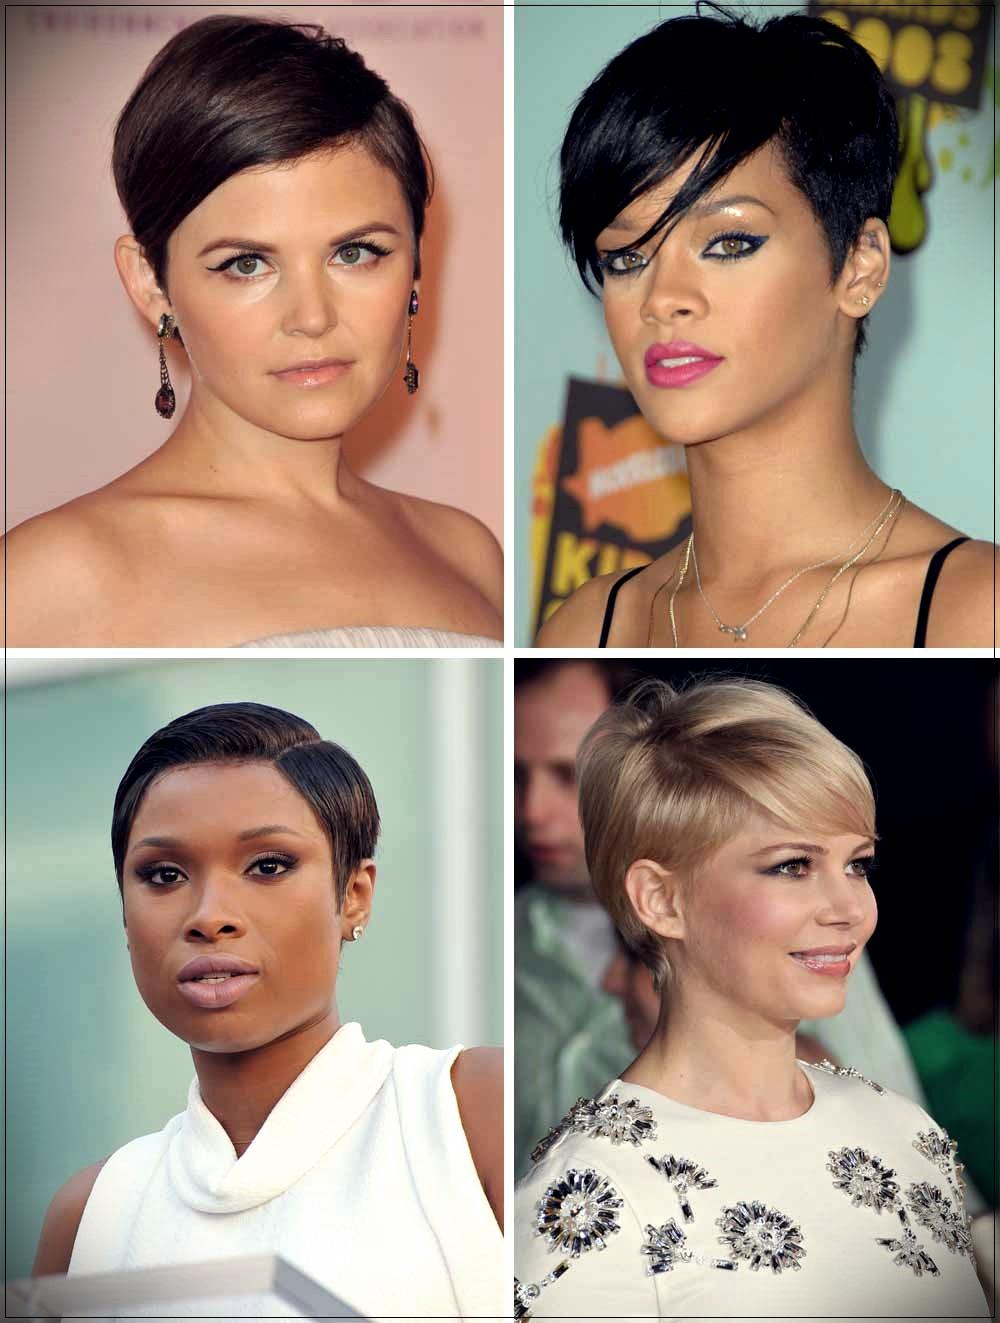 Pixie cut Ginnifer Goodwin, Rihanna, Jennifer Hudson, Michelle Williams